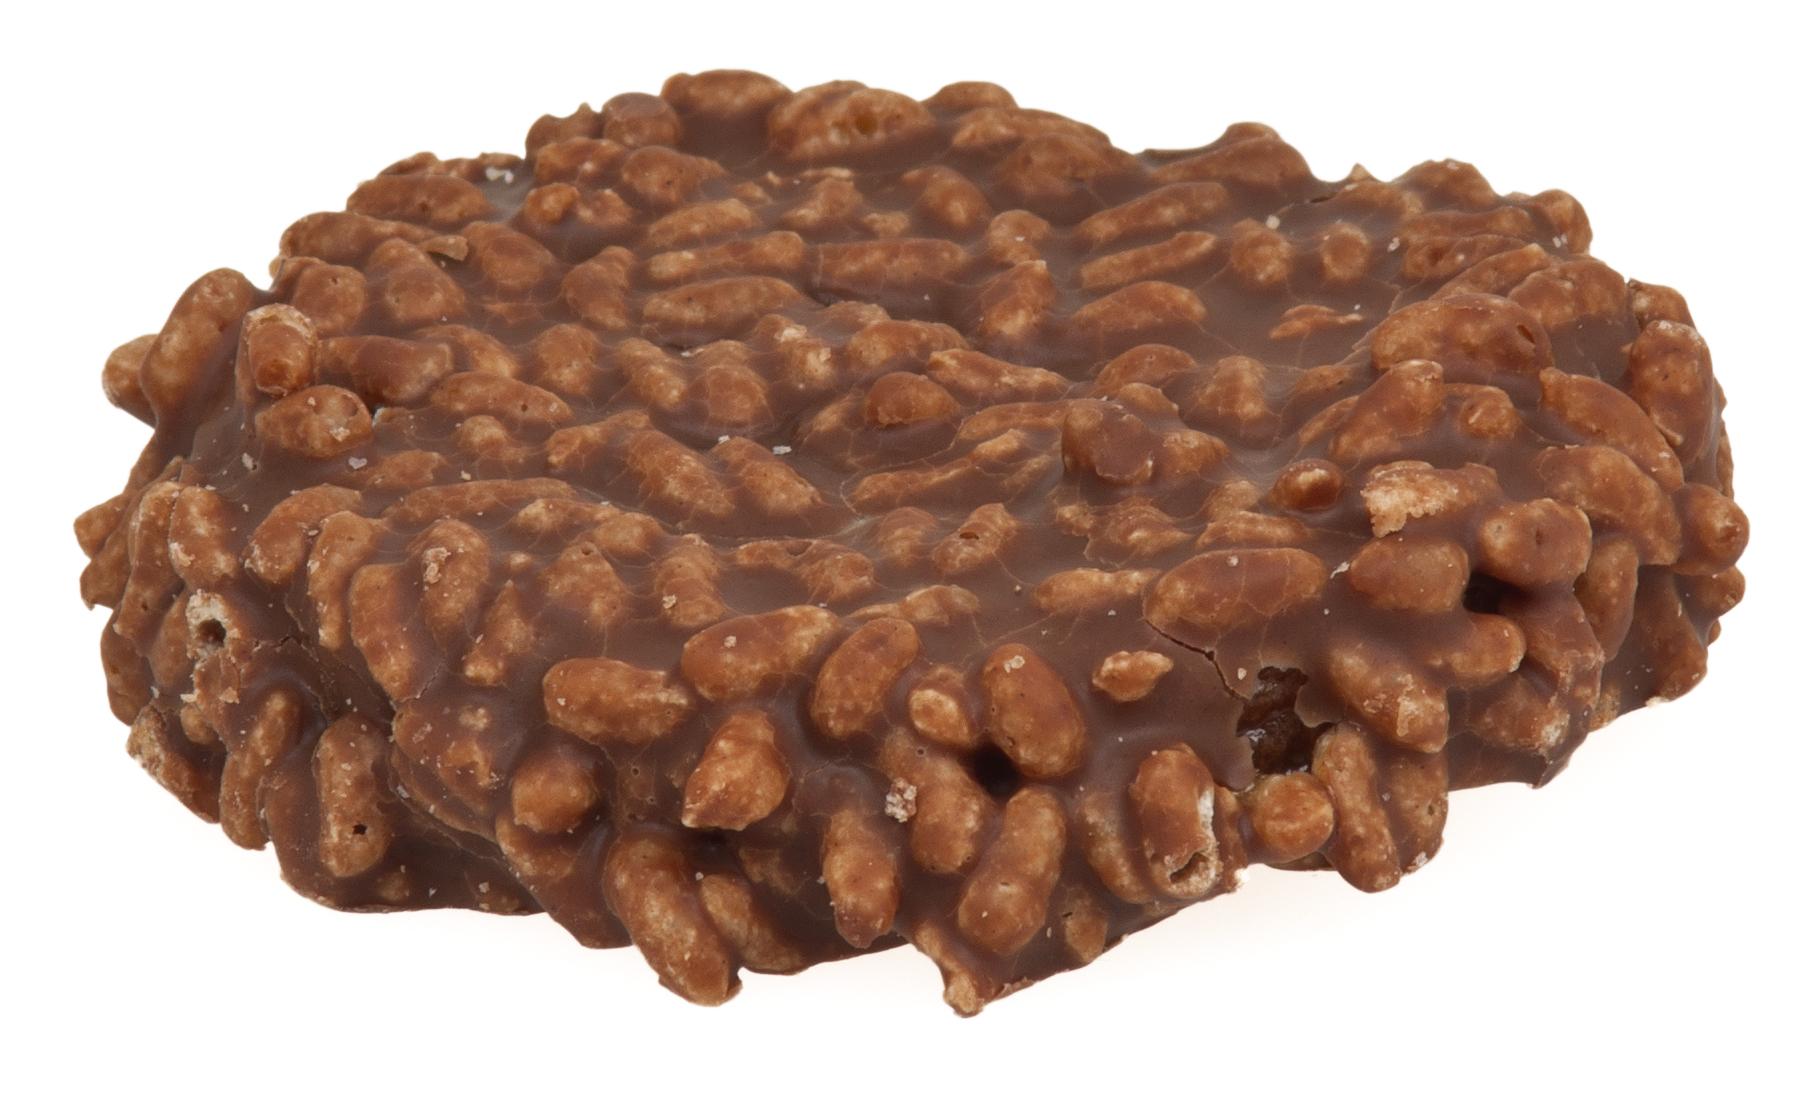 Caramel Crunch Chocolate Cake